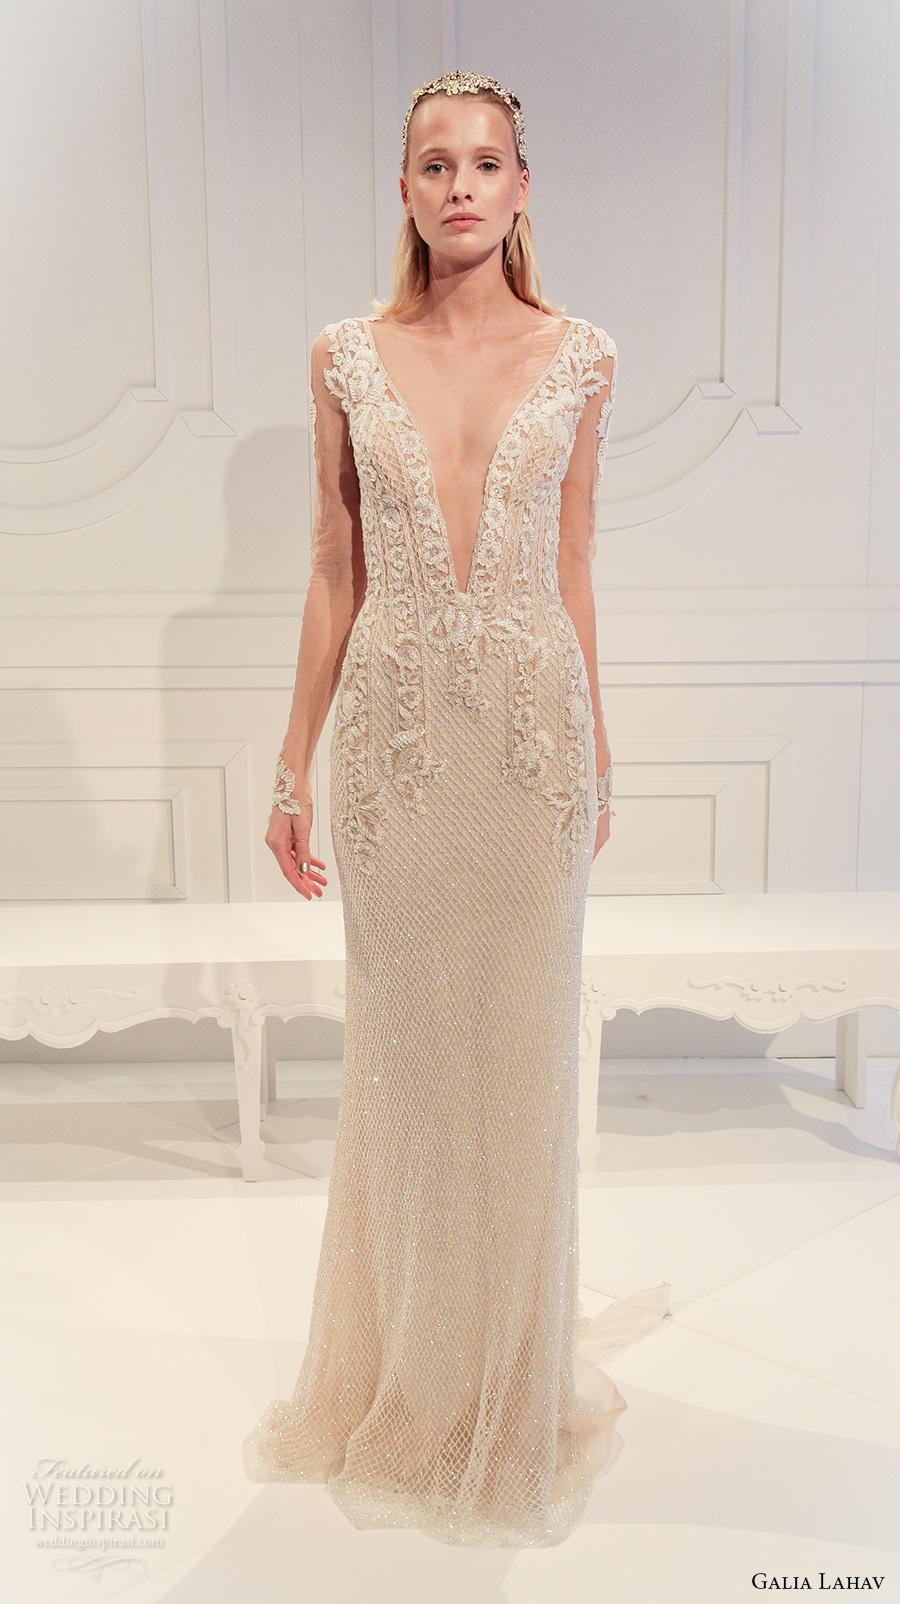 Galia lahav spring 2017 wedding dresses le secret royal for Wedding dresses with sheer illusion neckline